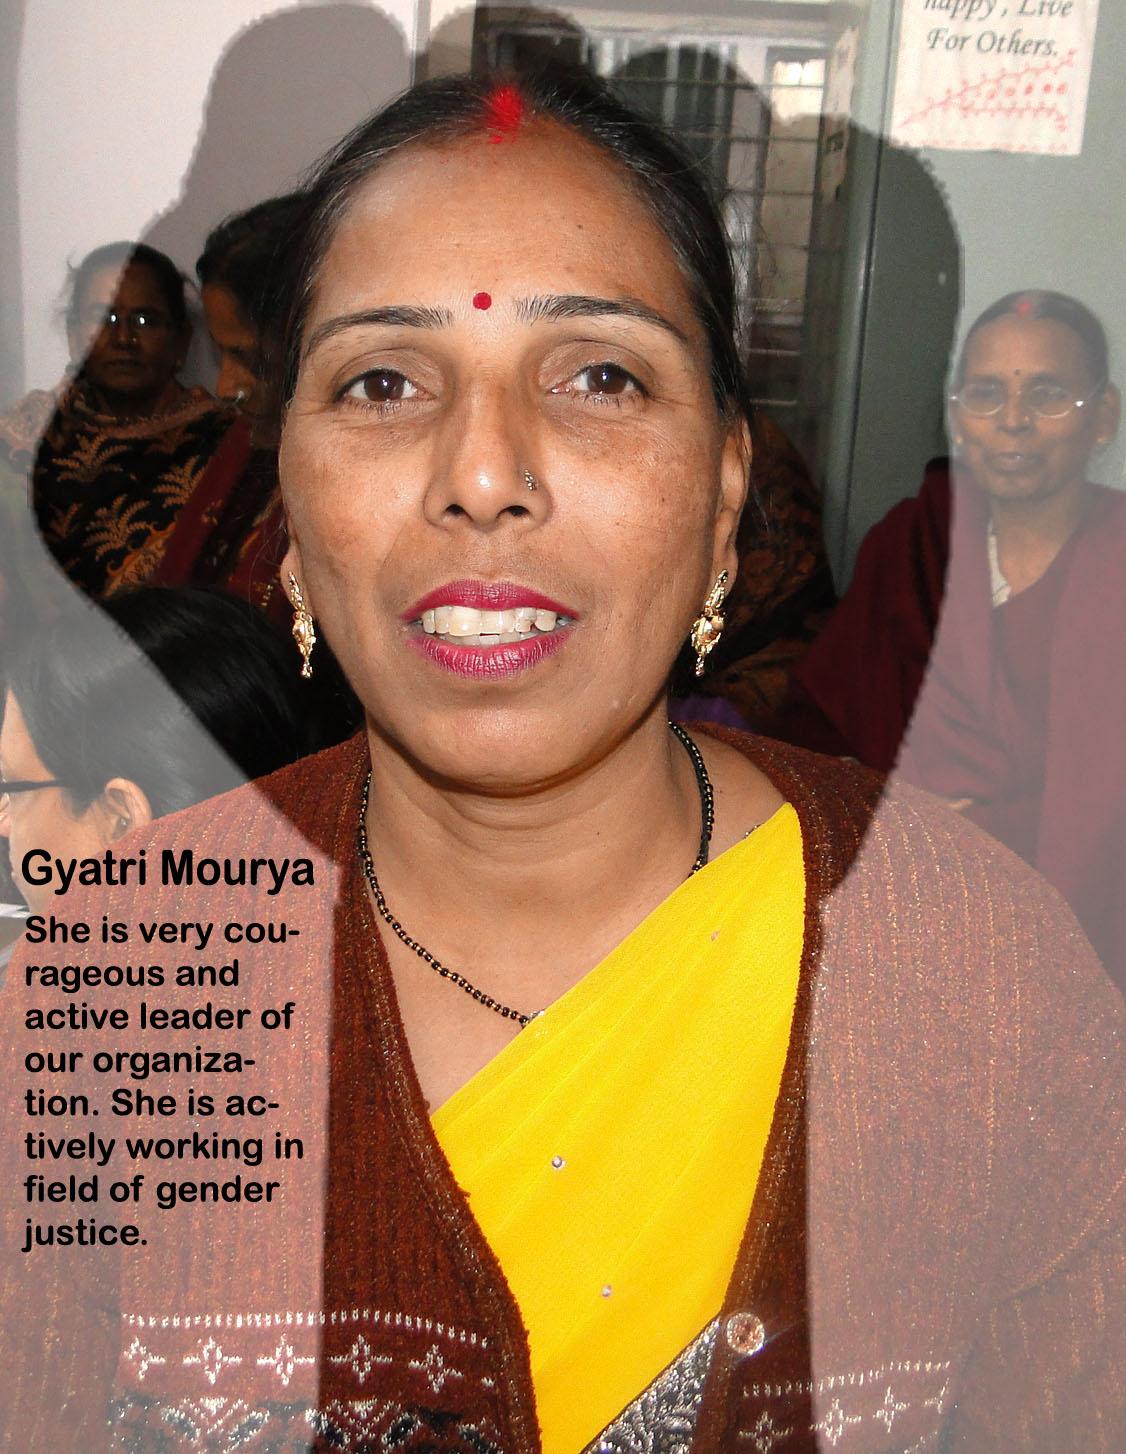 Gayati mourrya women human right defender--.jpg